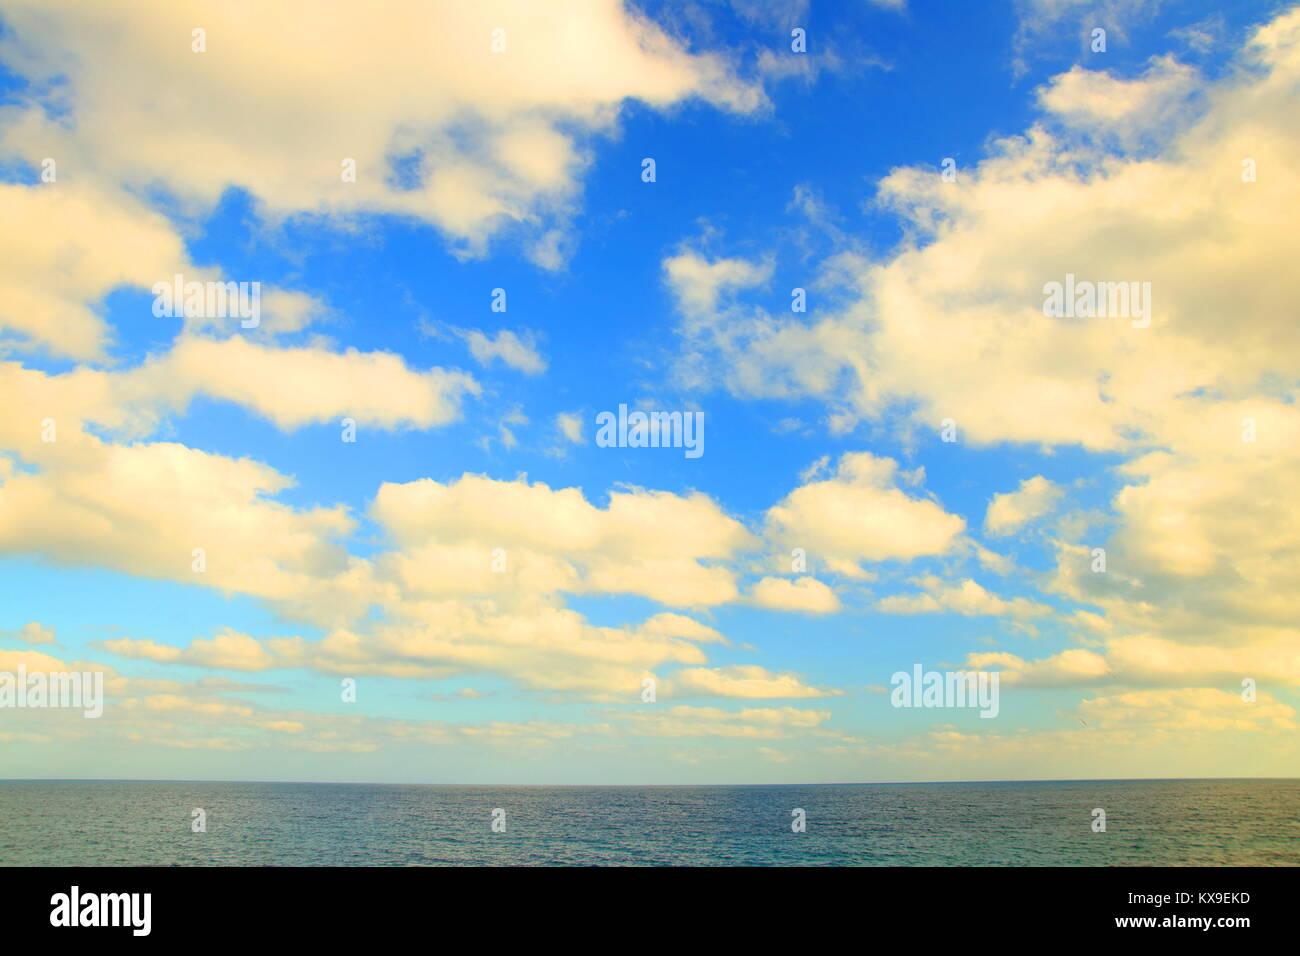 Cloudy sky and sea horizon - Stock Image